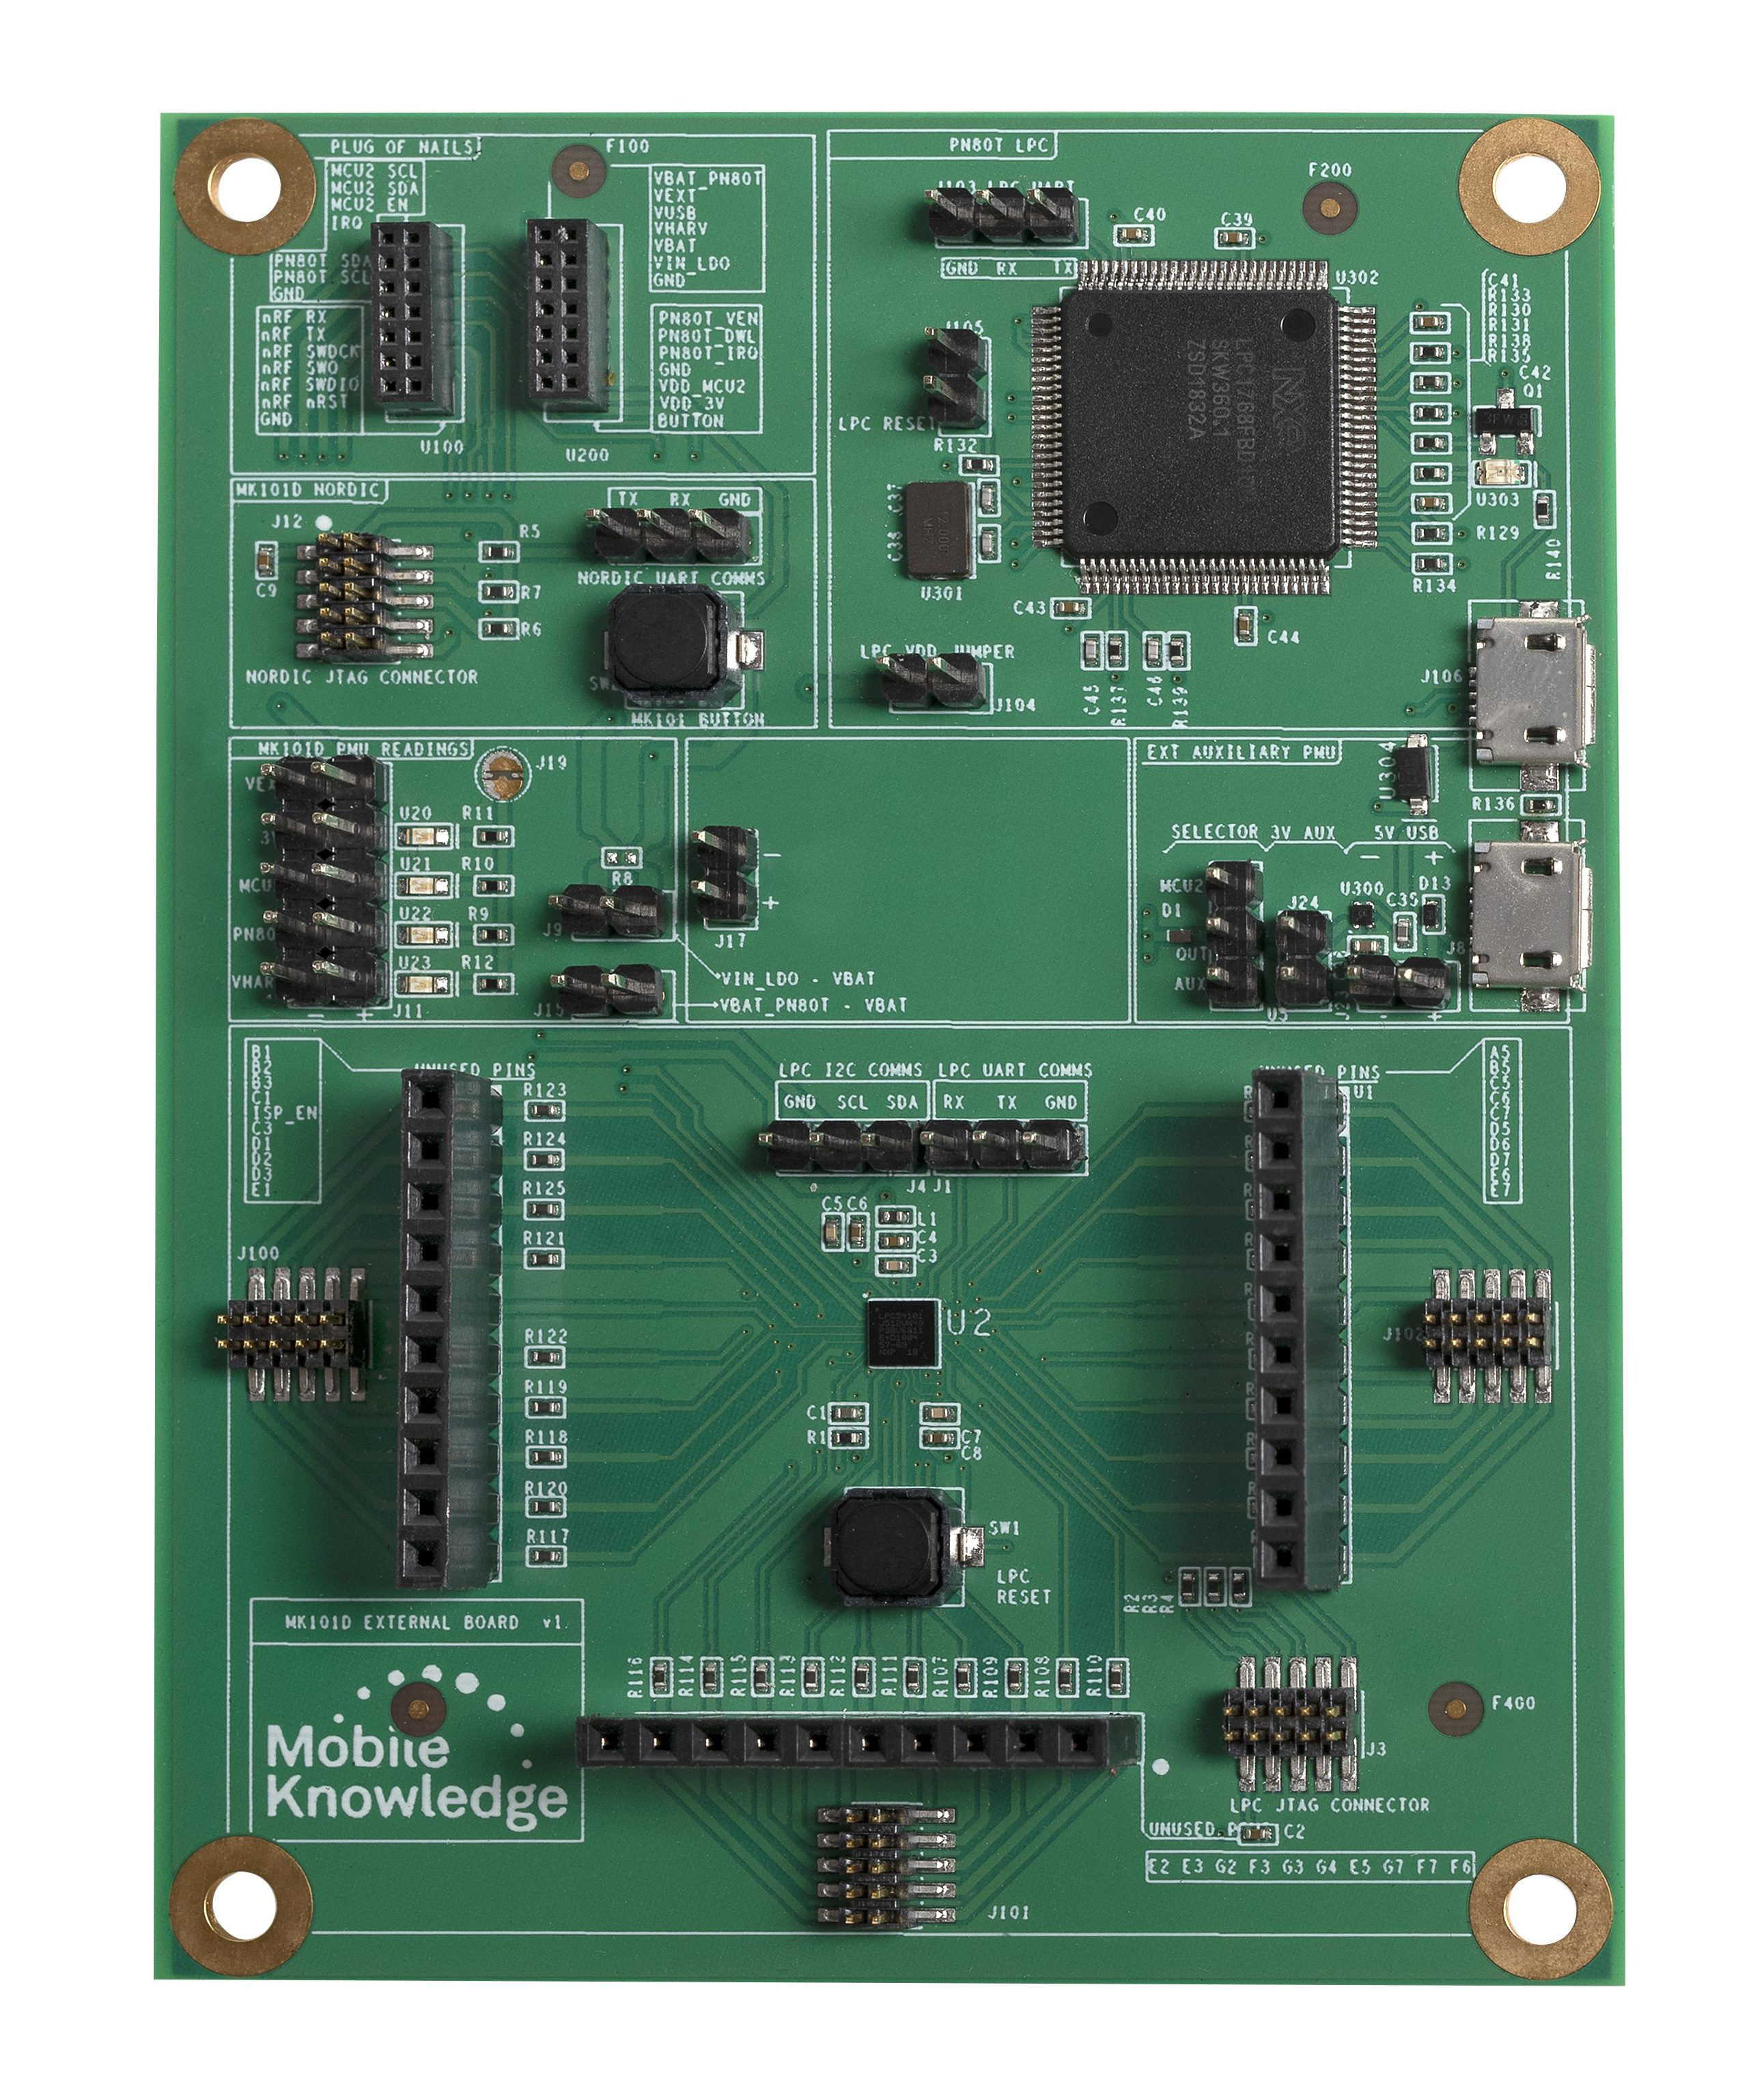 MK101 External Board